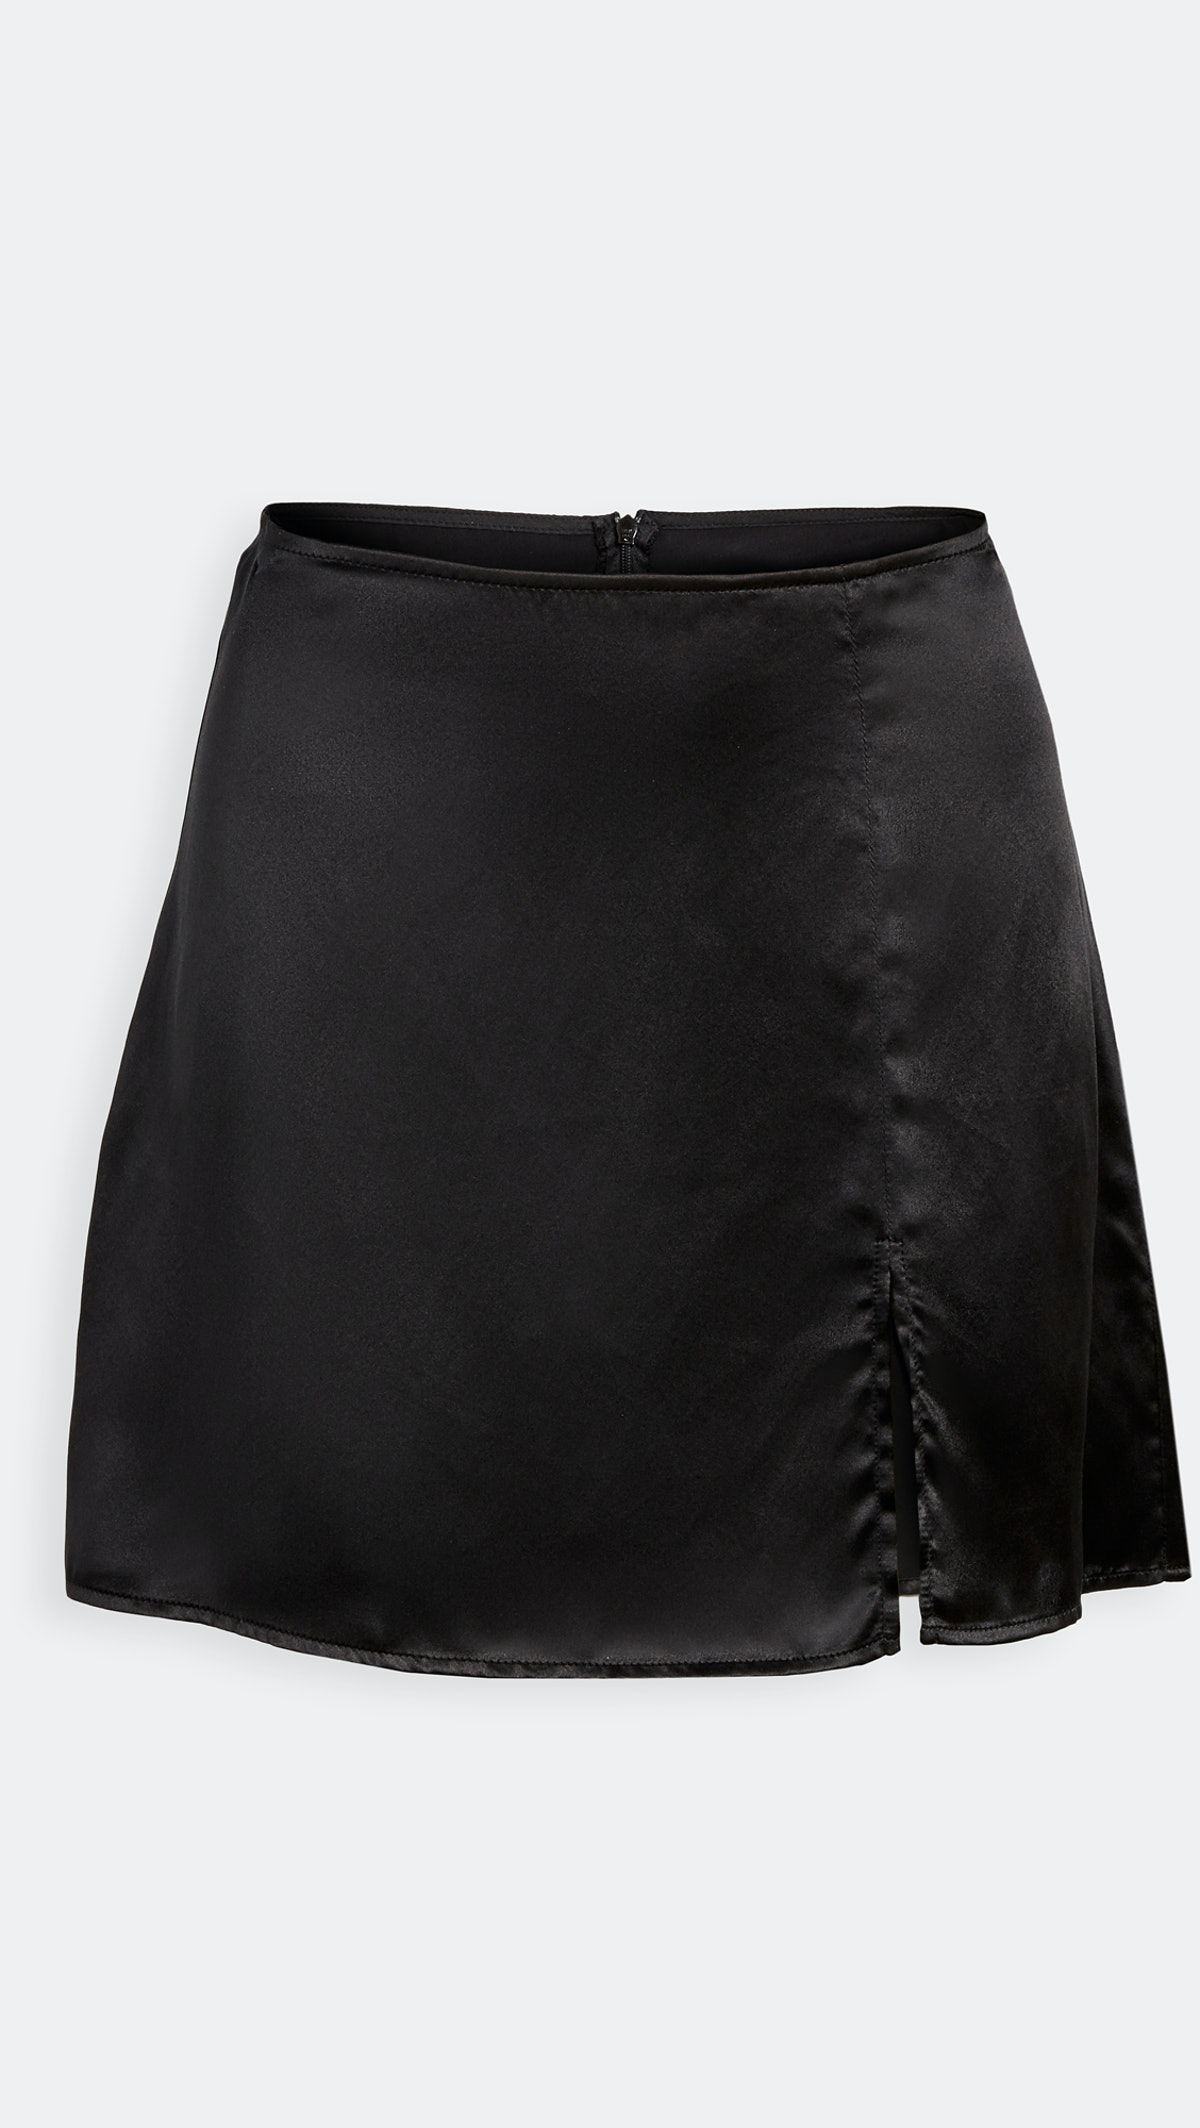 Robbie Skirt